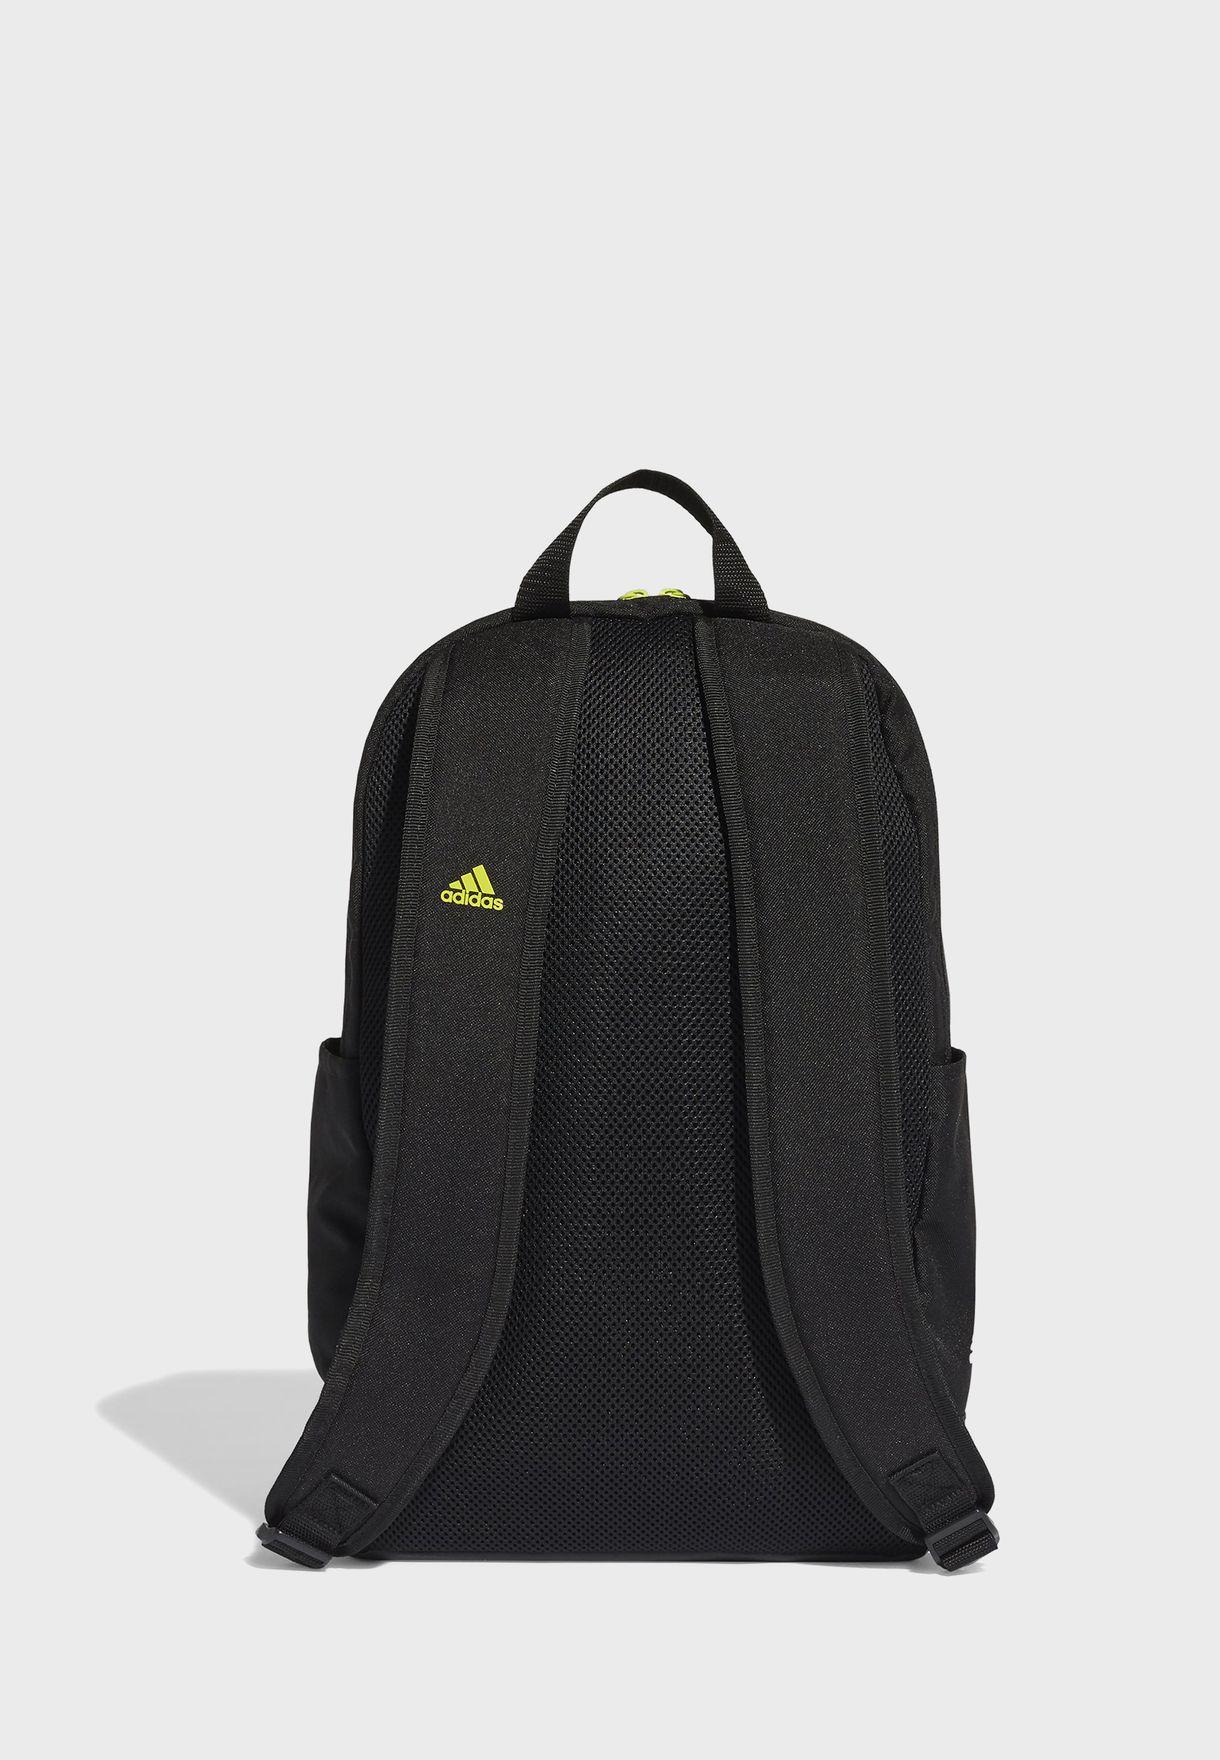 Cleofus Backpack